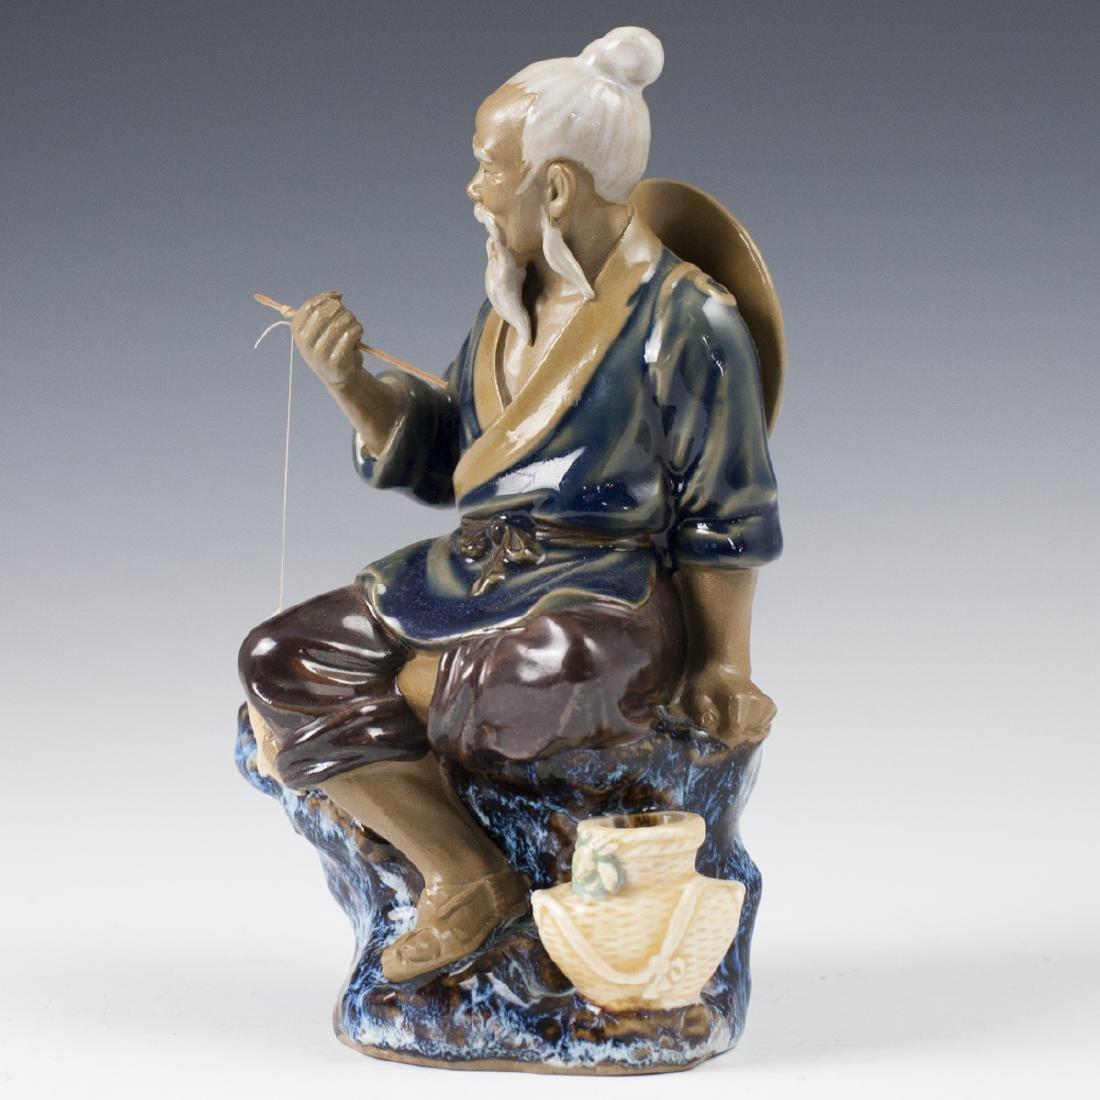 Chinese Glazed Ceramic Mudmen Figurines - 8